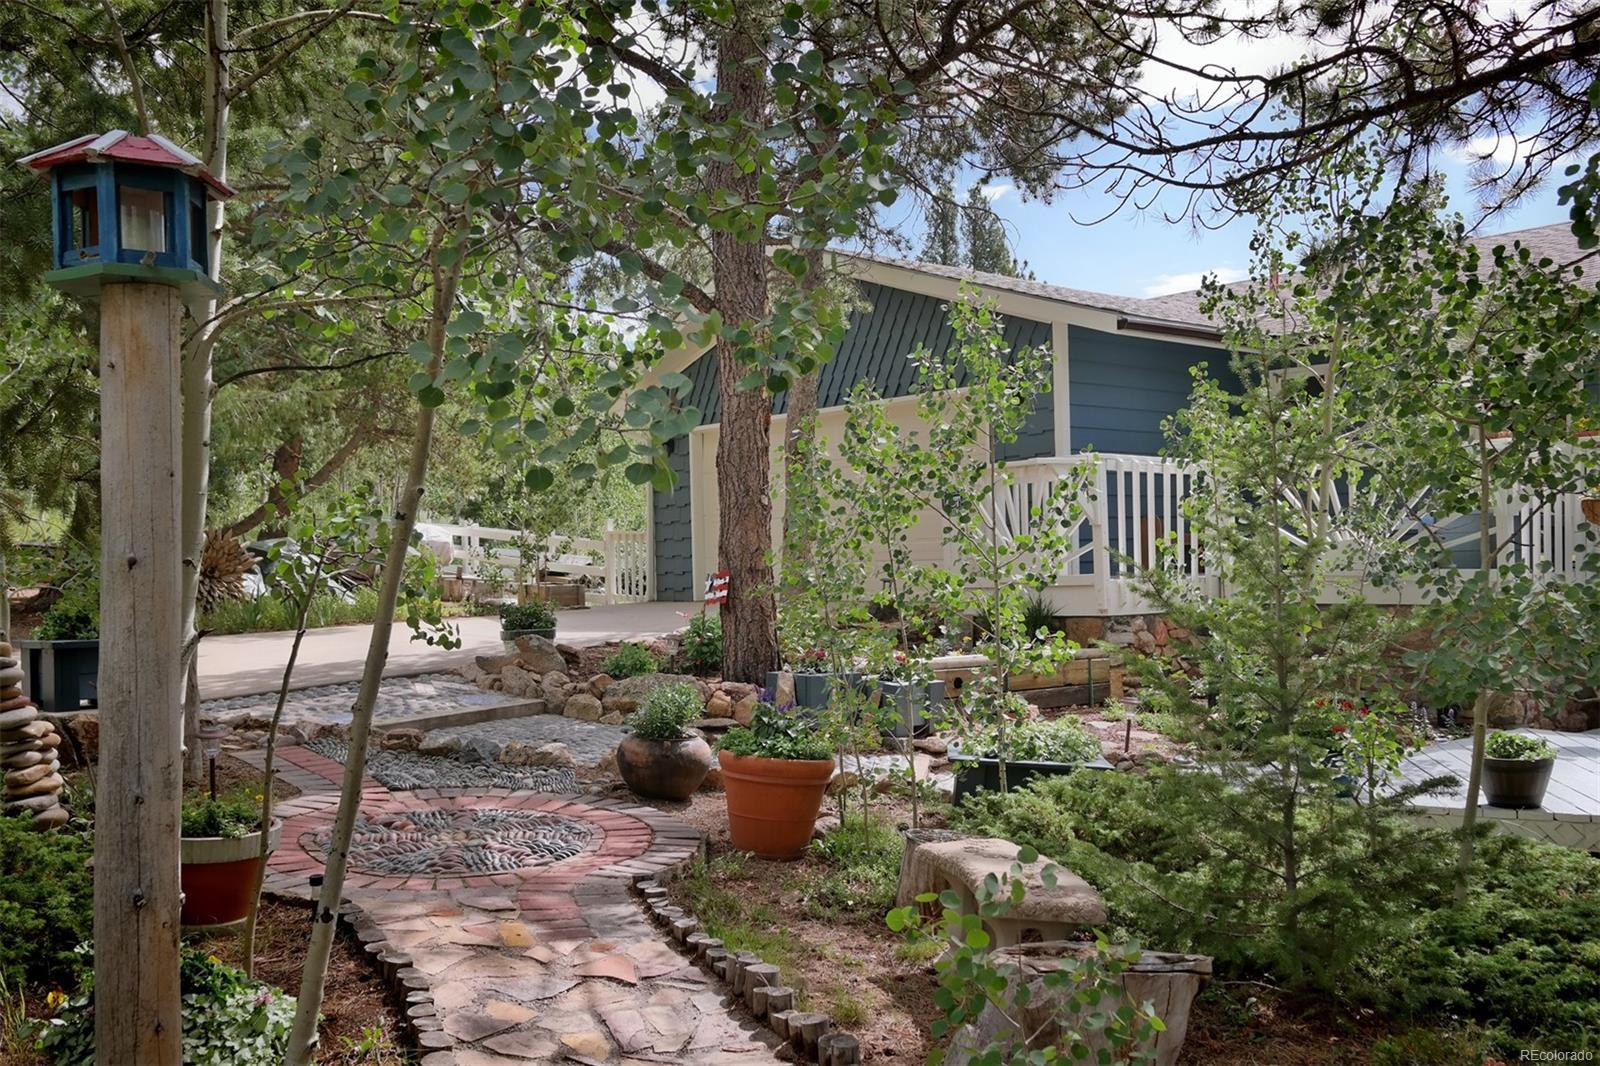 Fenced Area & Garden Beds